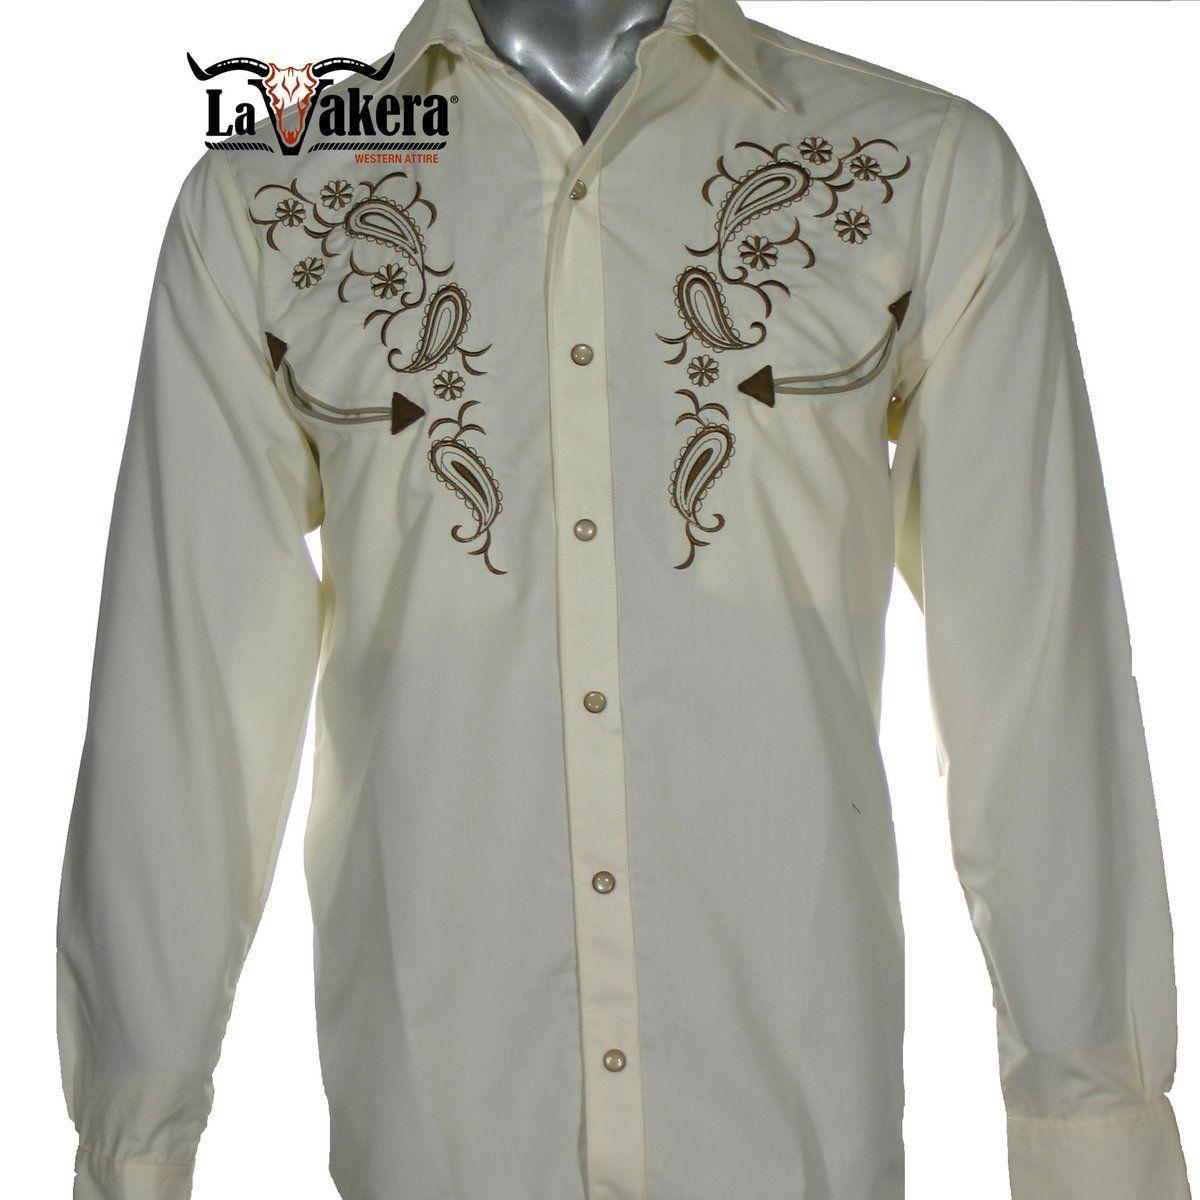 88d029598480c Camisa Vaquera Bordada Rangers Rafael Amaya